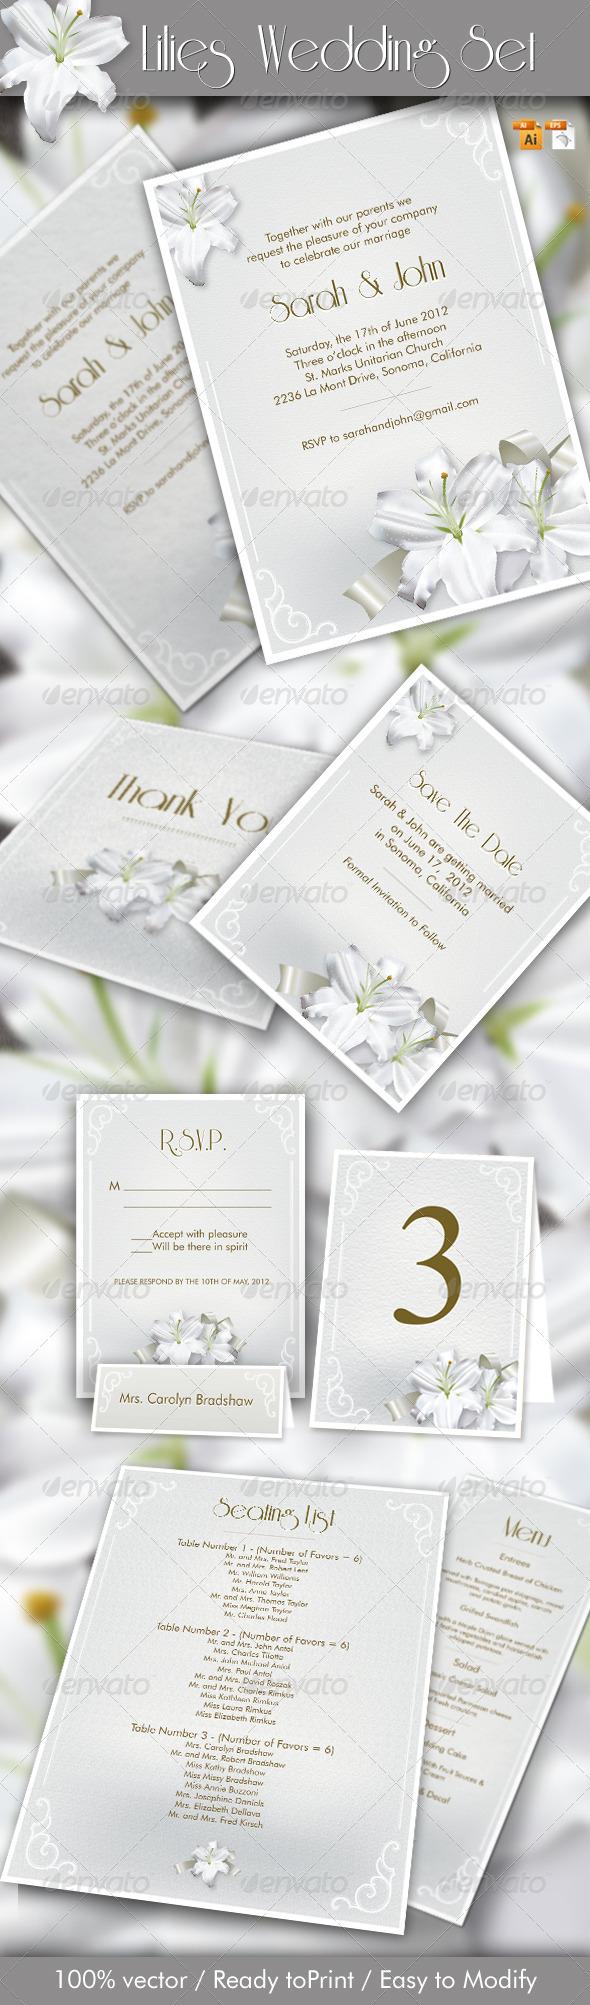 GraphicRiver Lilies Wedding Set 1694540